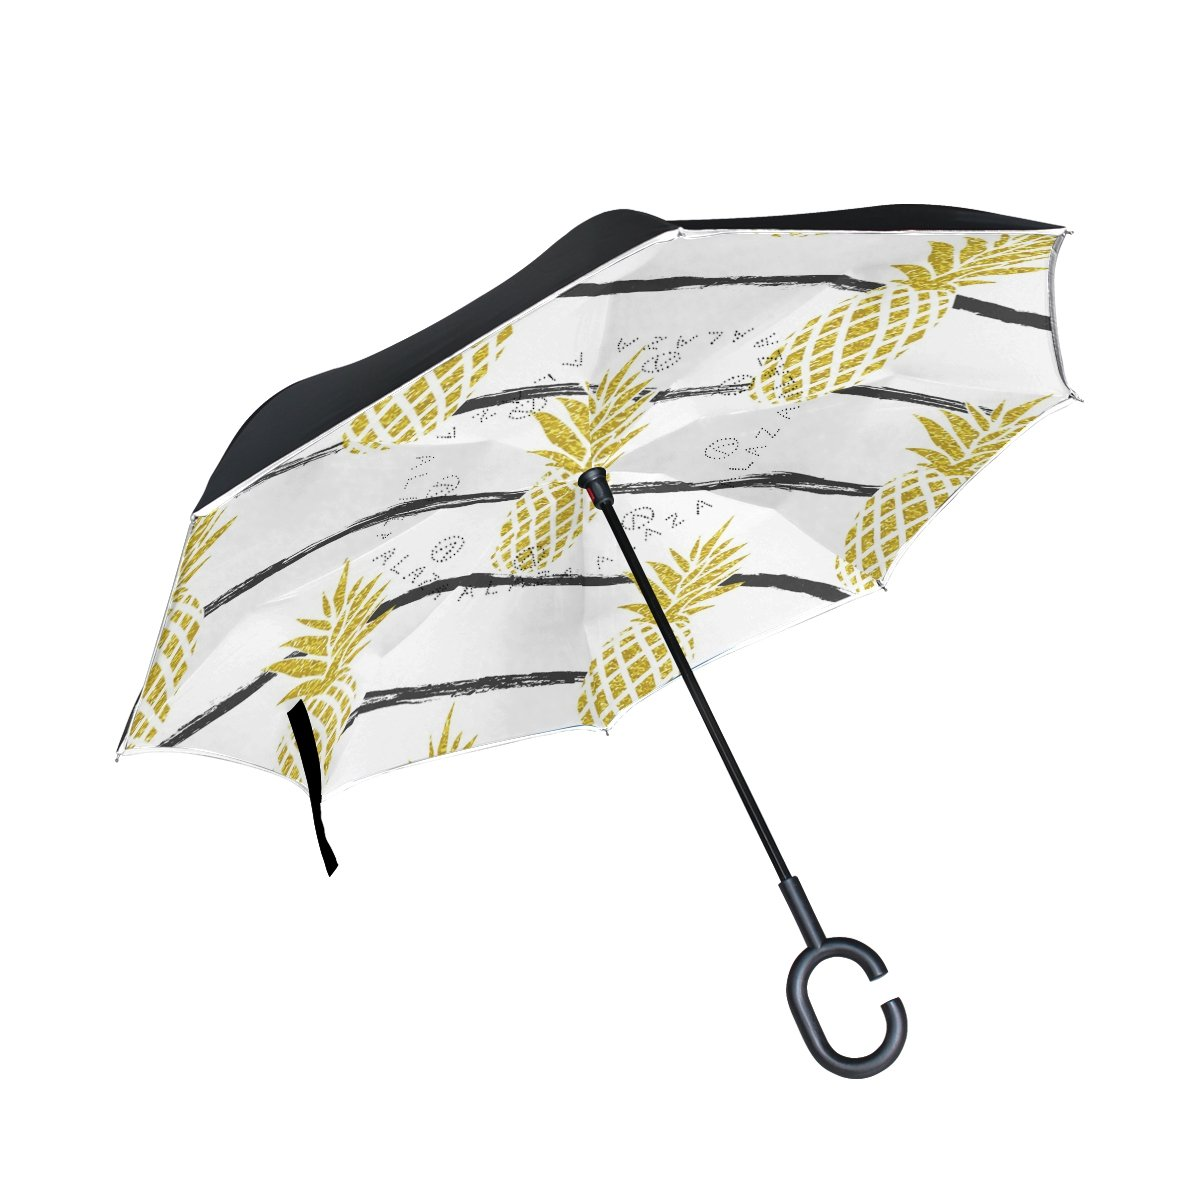 Vipsk Umbrella Reverse Umbrella Gold Yellow Color Pineapple White Creative Cars Umbrella Double Layer Inverted Umbrella Windproof Straight Waterproof Inside Out Travel Umbrellas